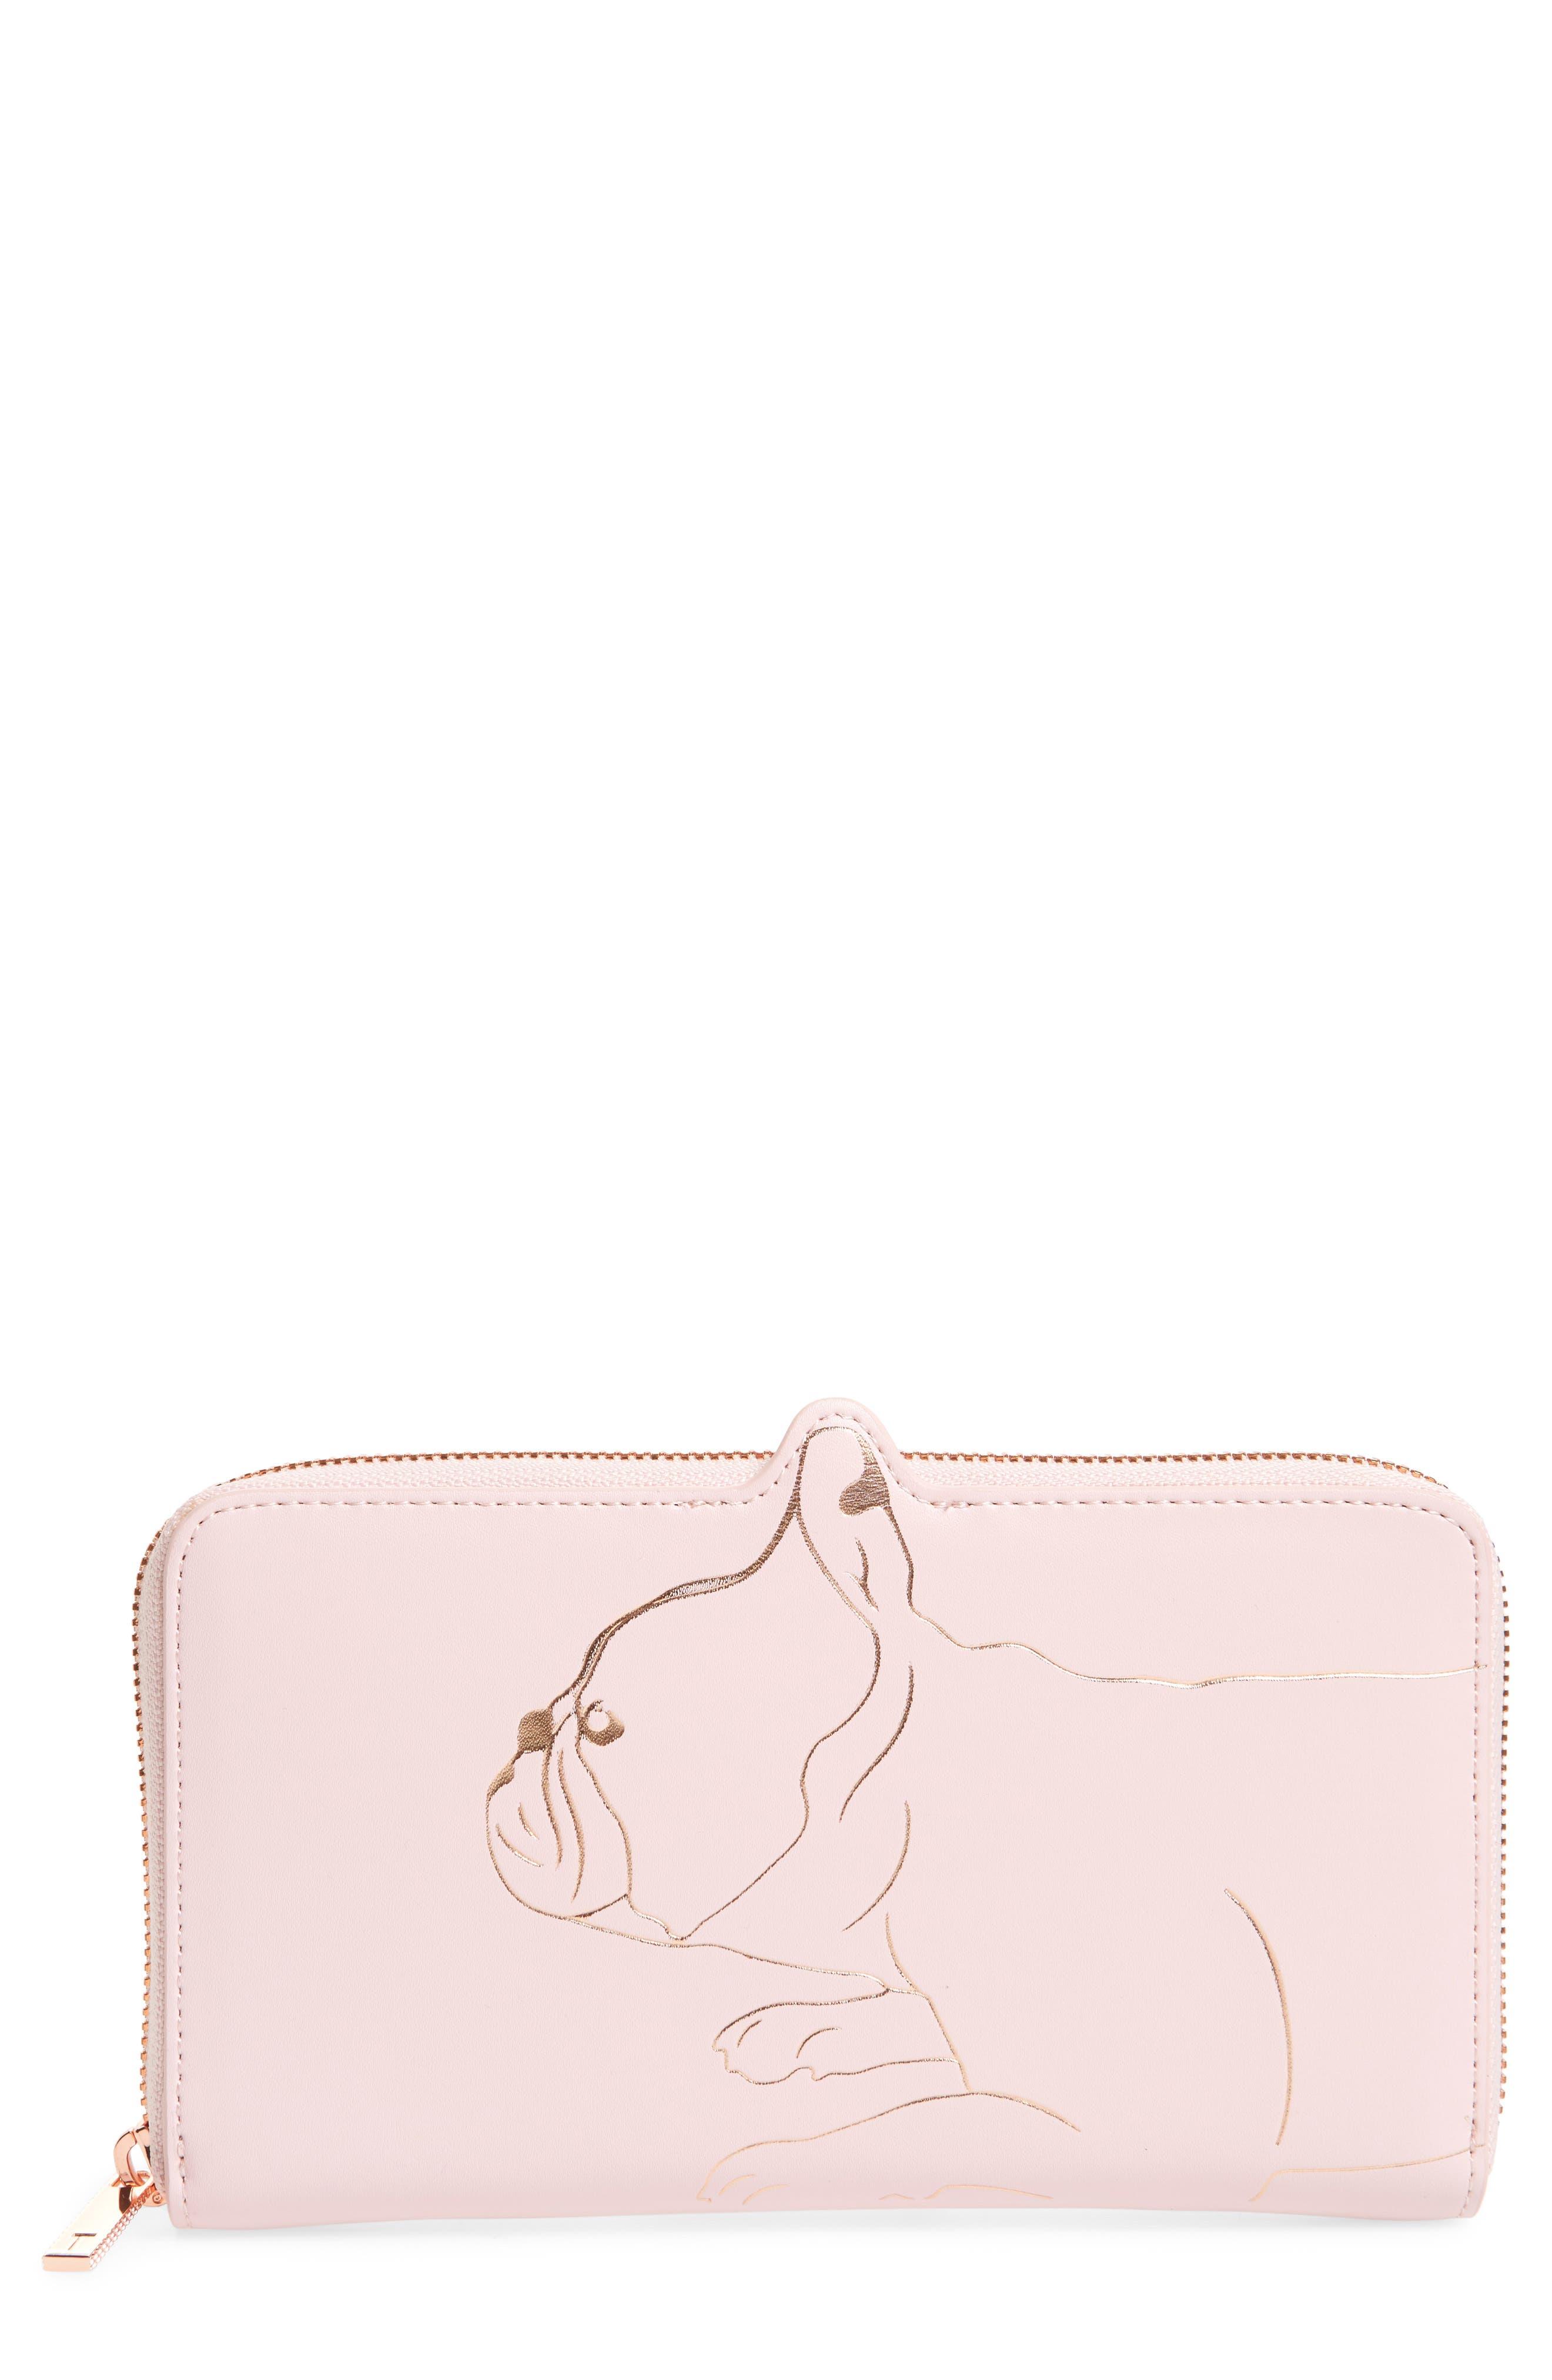 Carryn Matinée Leather Wallet,                             Main thumbnail 1, color,                             683